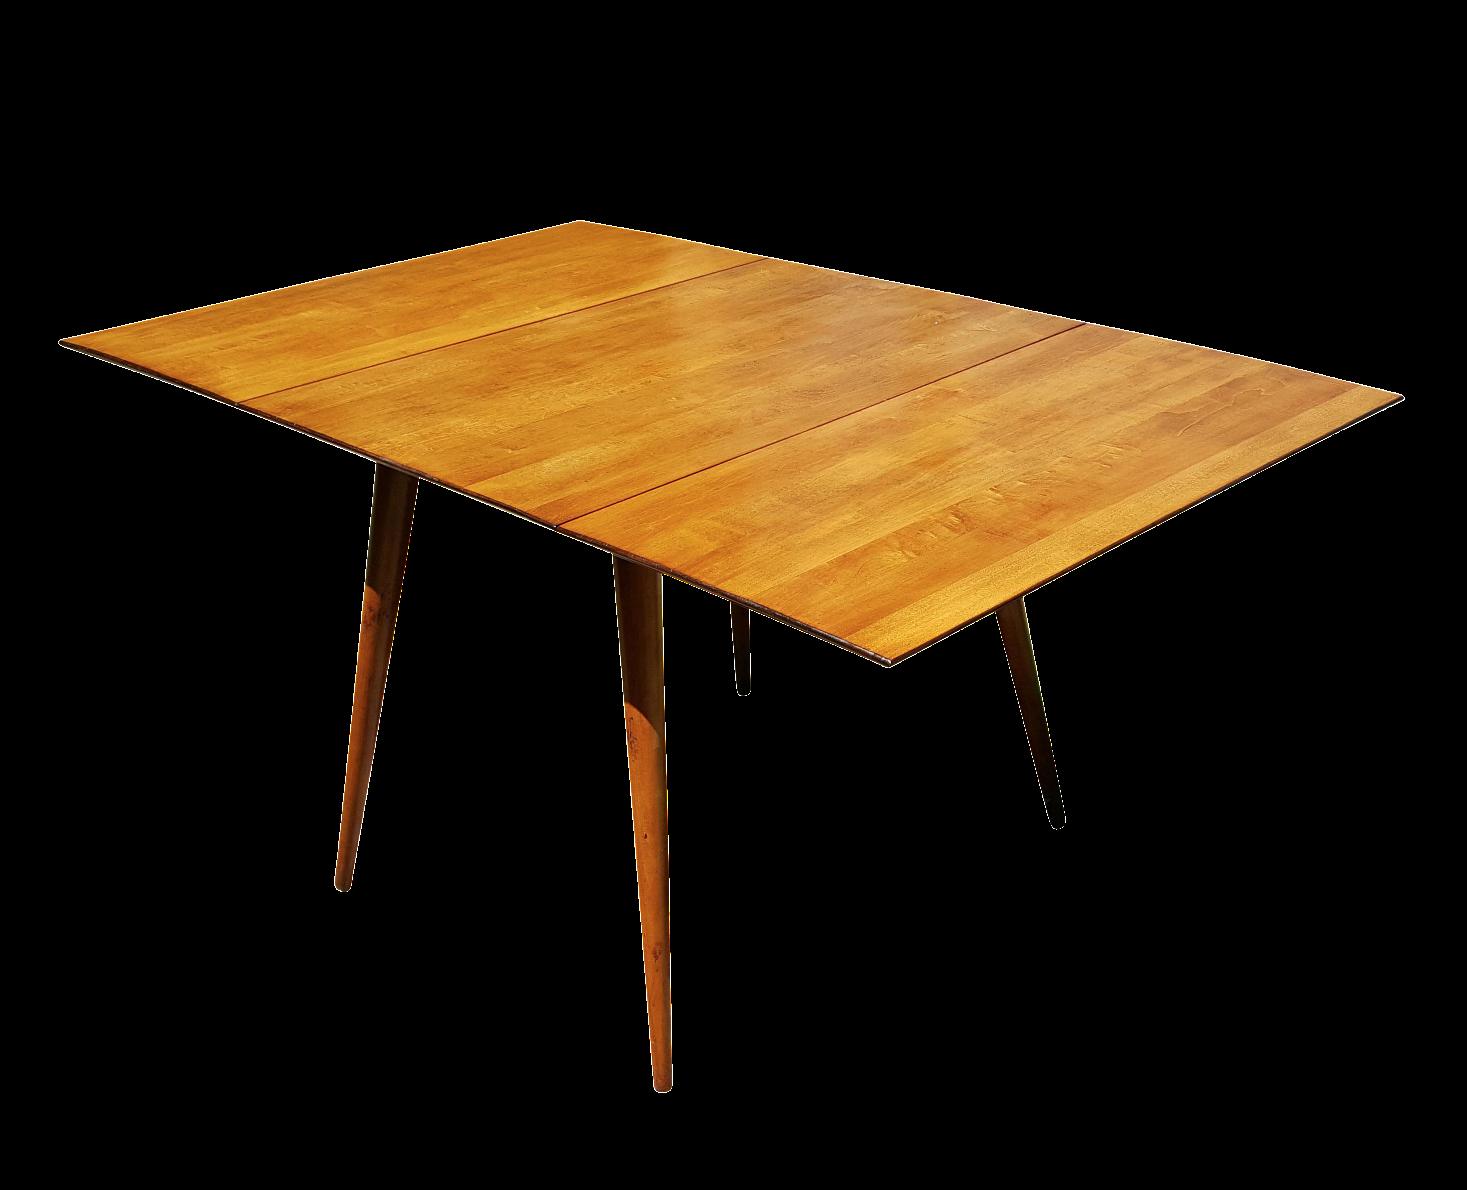 Paul McCobb Planner Group Drop Leaf Dining Table Chairish : 3a6075a4 5d91 47aa 94e0 f1e4f0c883f2 from www.chairish.com size 1467 x 1190 png 635kB